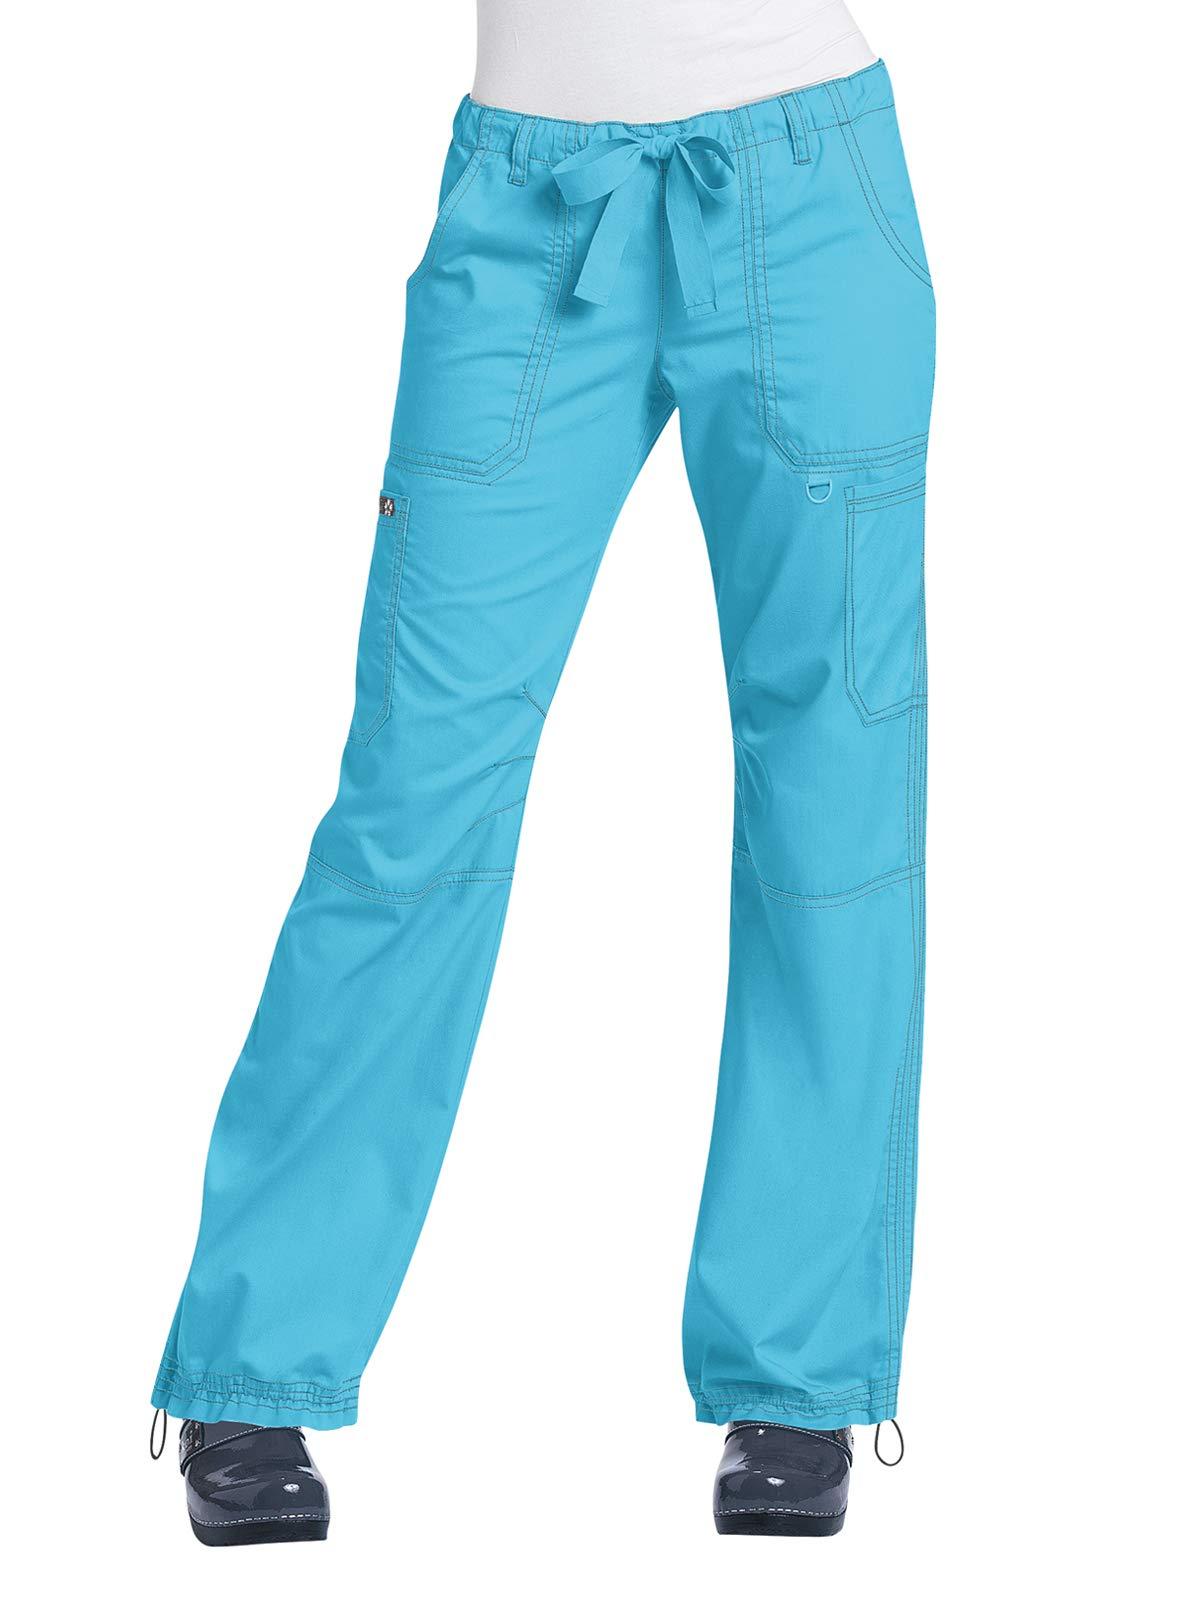 KOI Classics 701 Women's Lindsey Scrub Pant Electric Blue 3X Petite